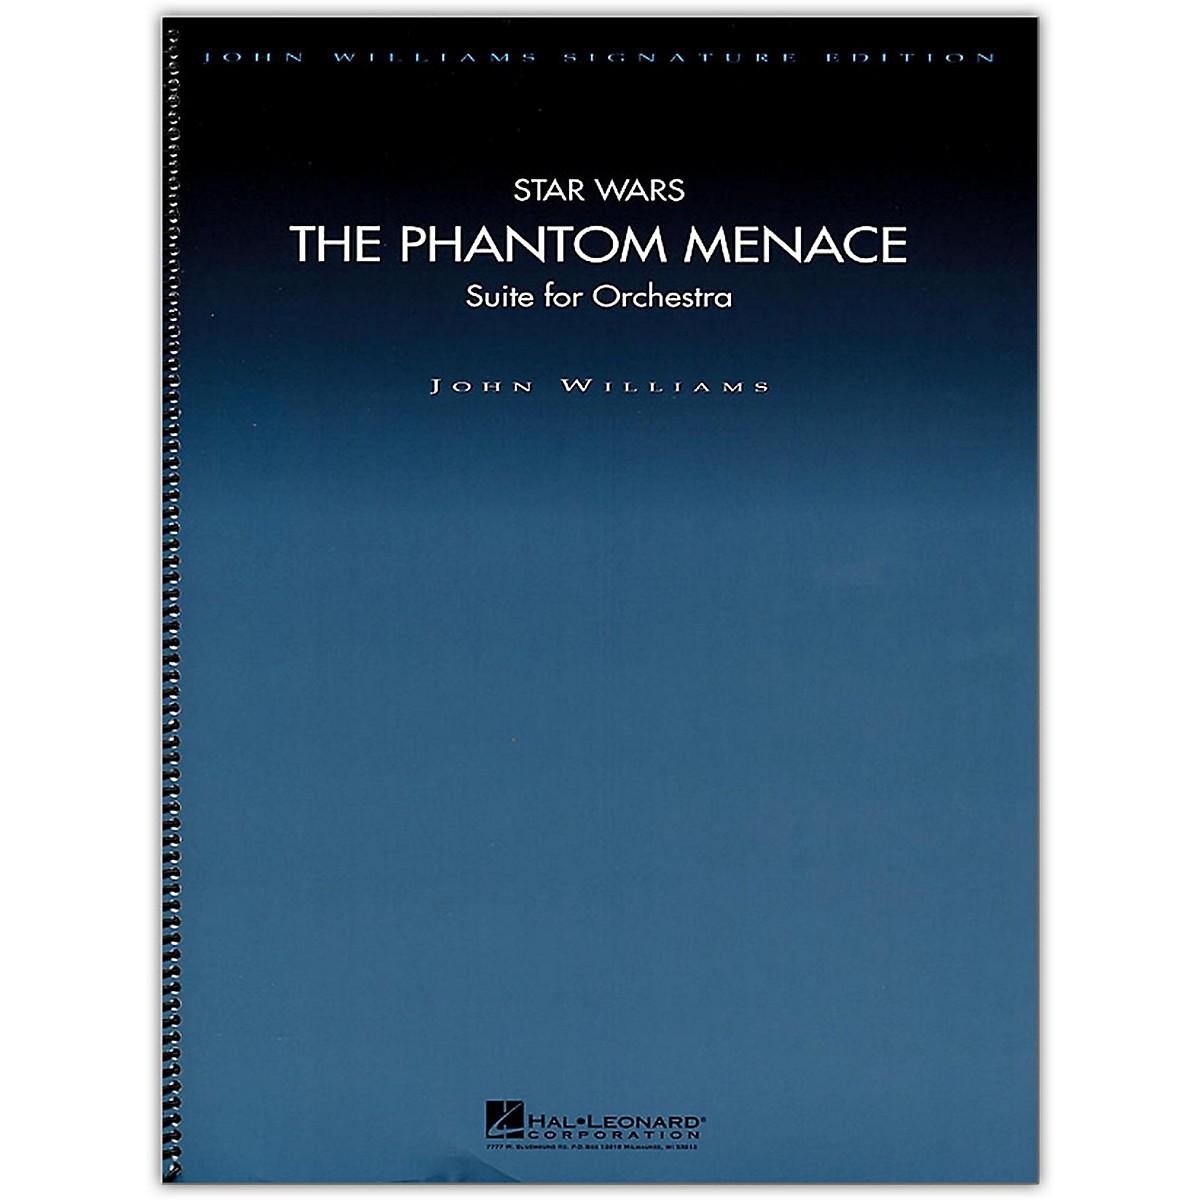 Hal Leonard Star Wars: The Phantom Menace - John Williams Signature Edition Orchestra